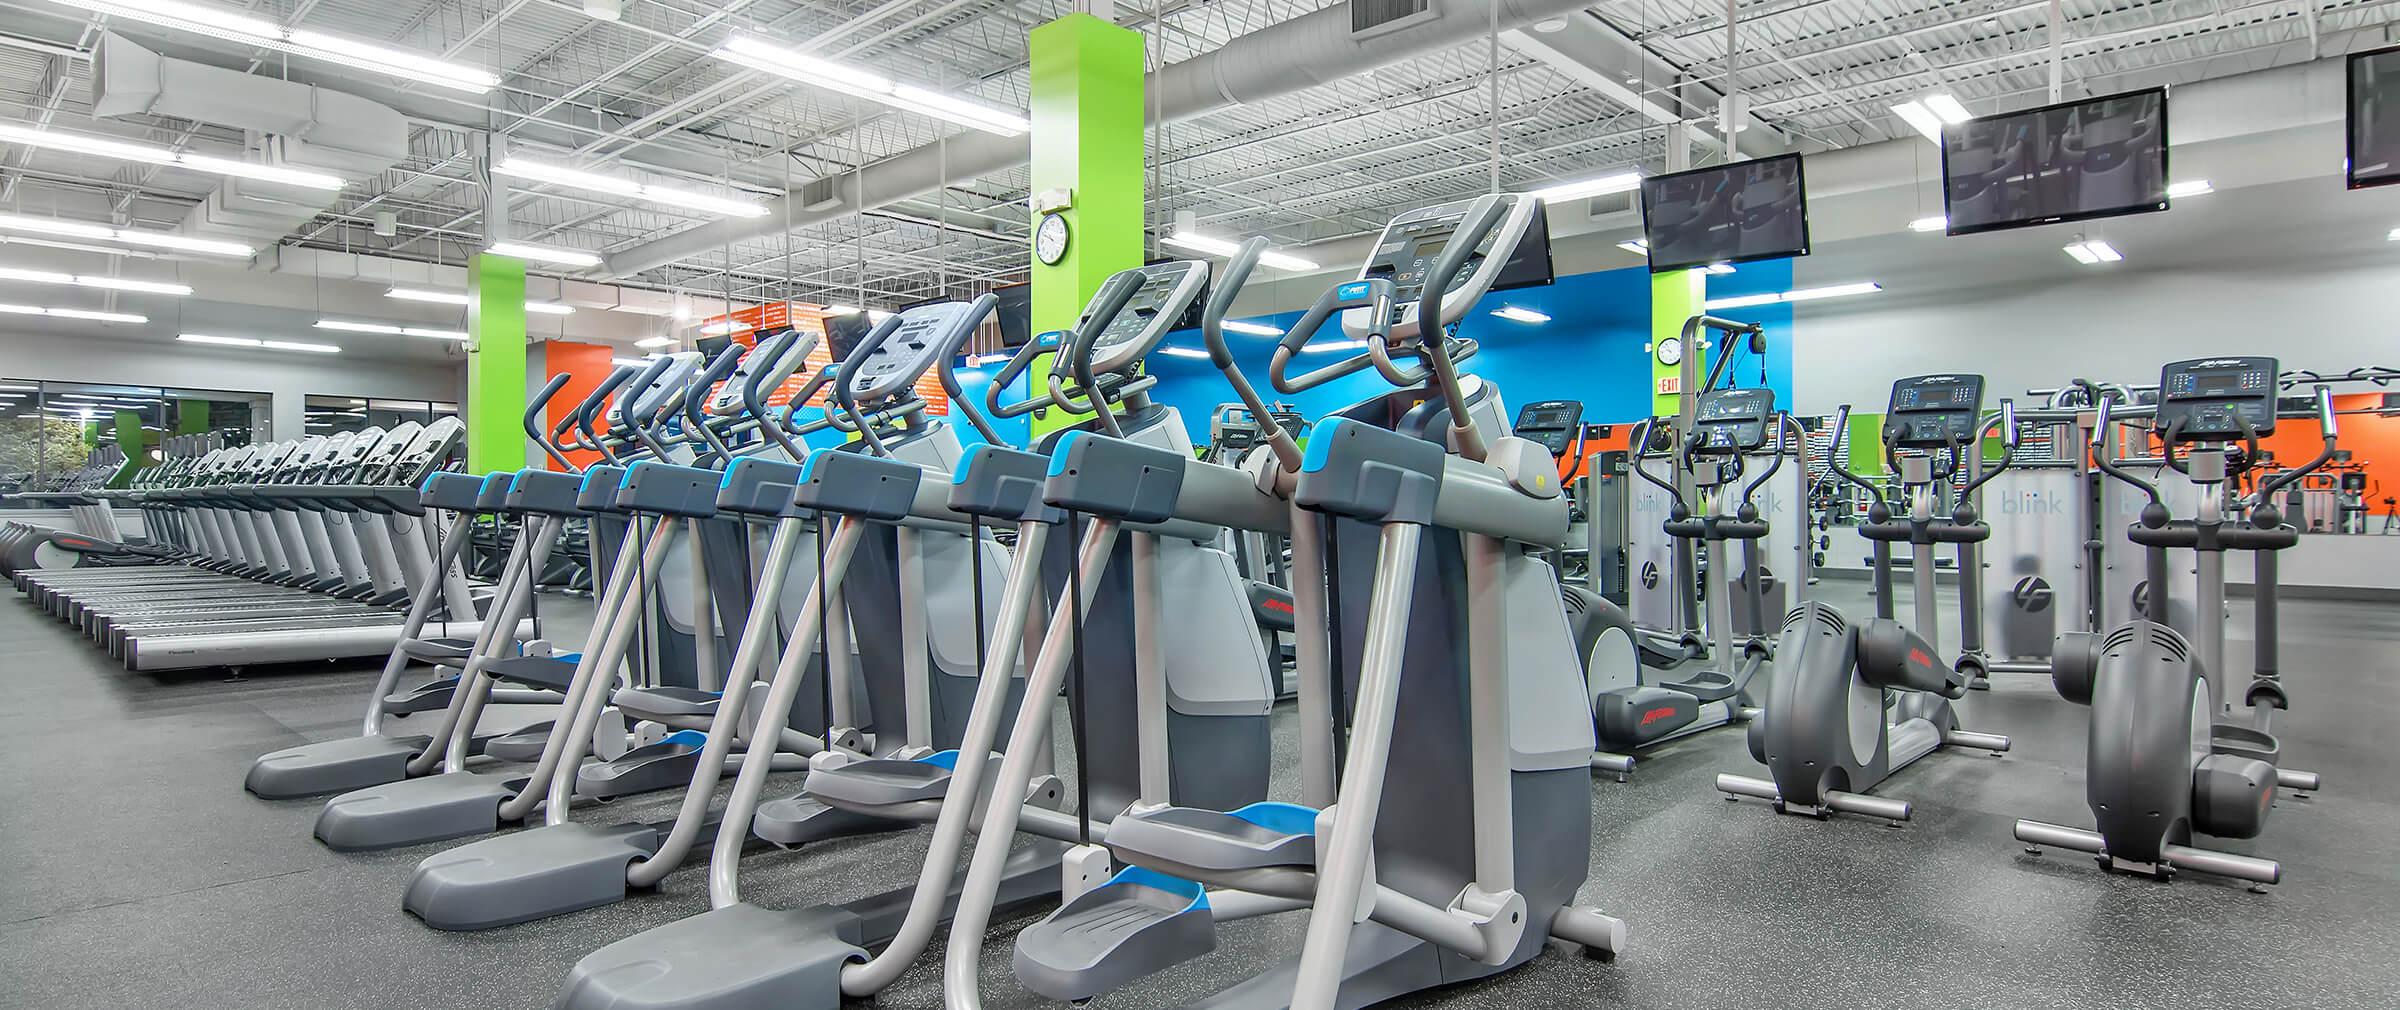 Gym In West Islip Ny 175 Sunrise Highway Blink Fitness